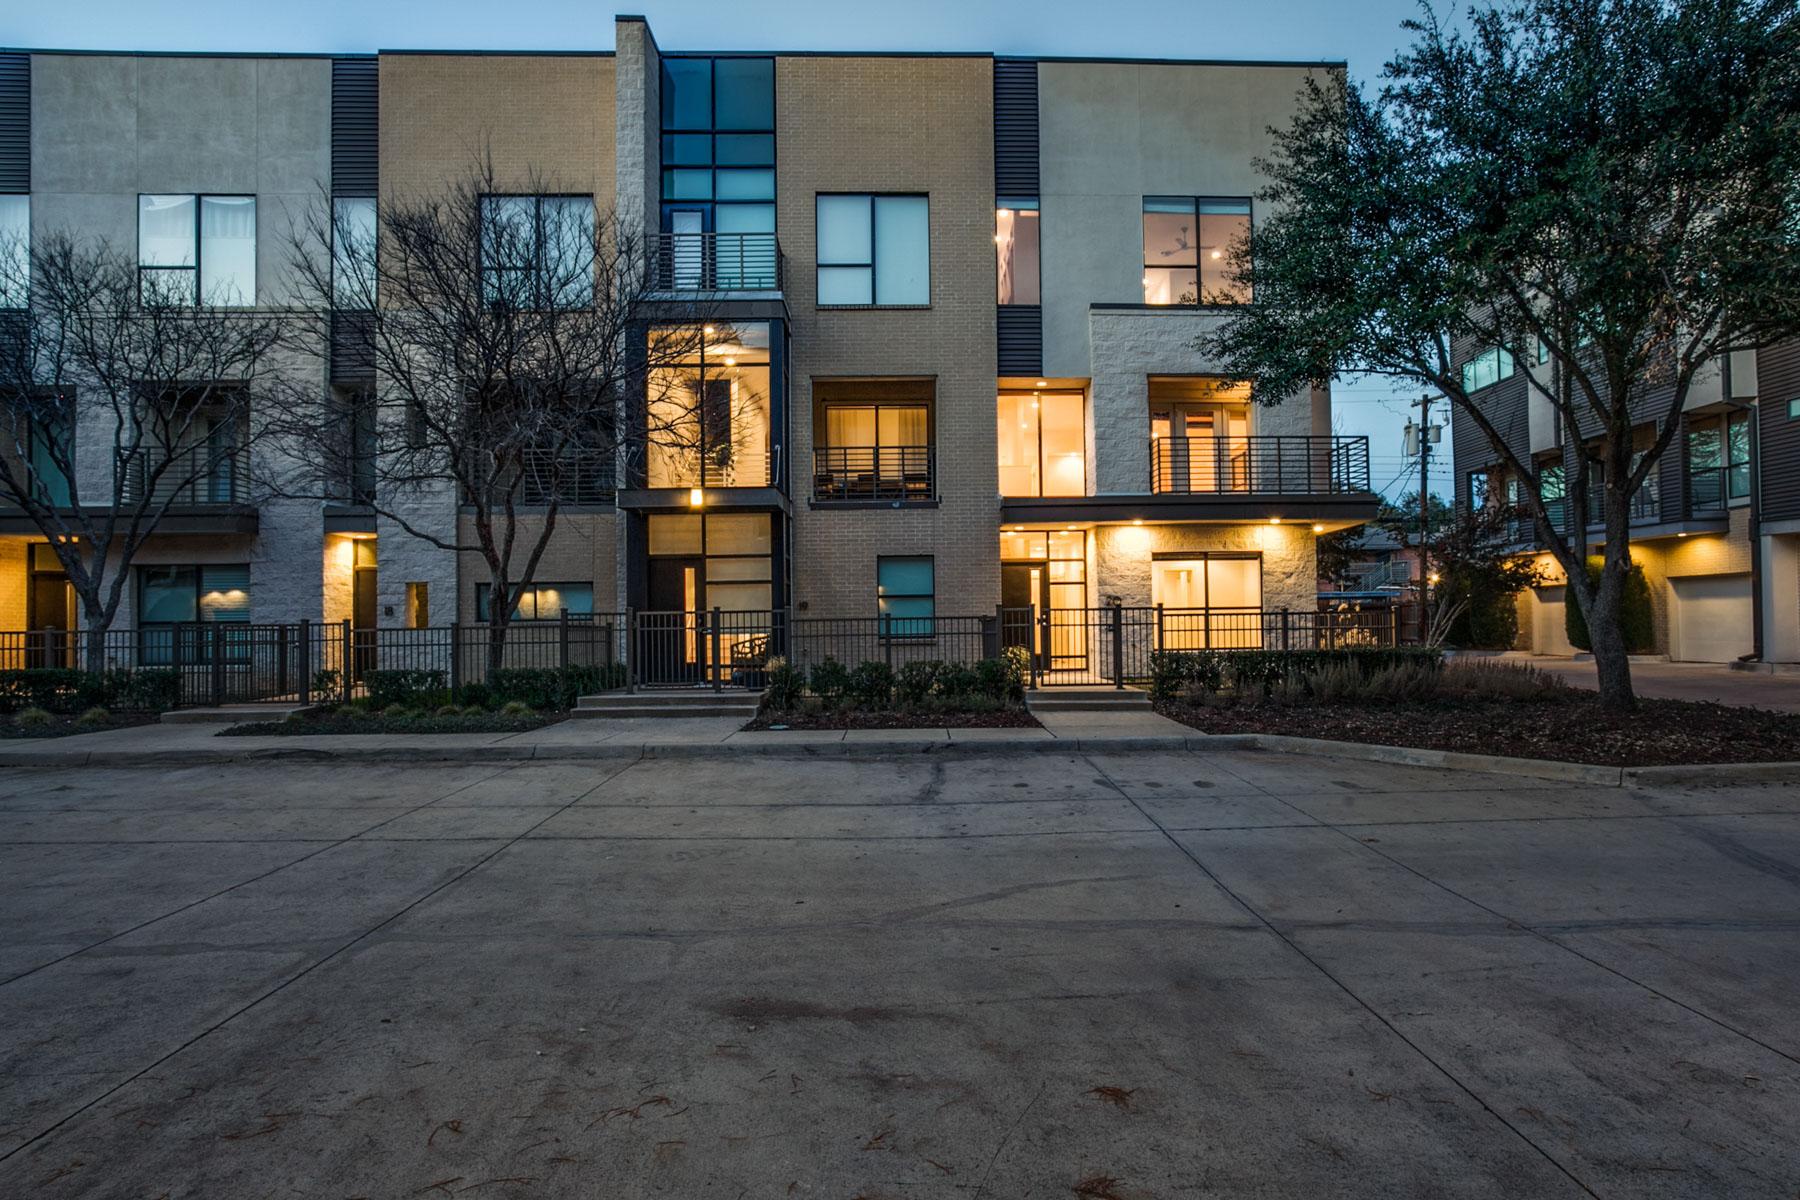 Condomínio para Venda às 4111 Newton Avenue 20, Dallas 4111 Newton Ave 20 Dallas, Texas, 75219 Estados Unidos